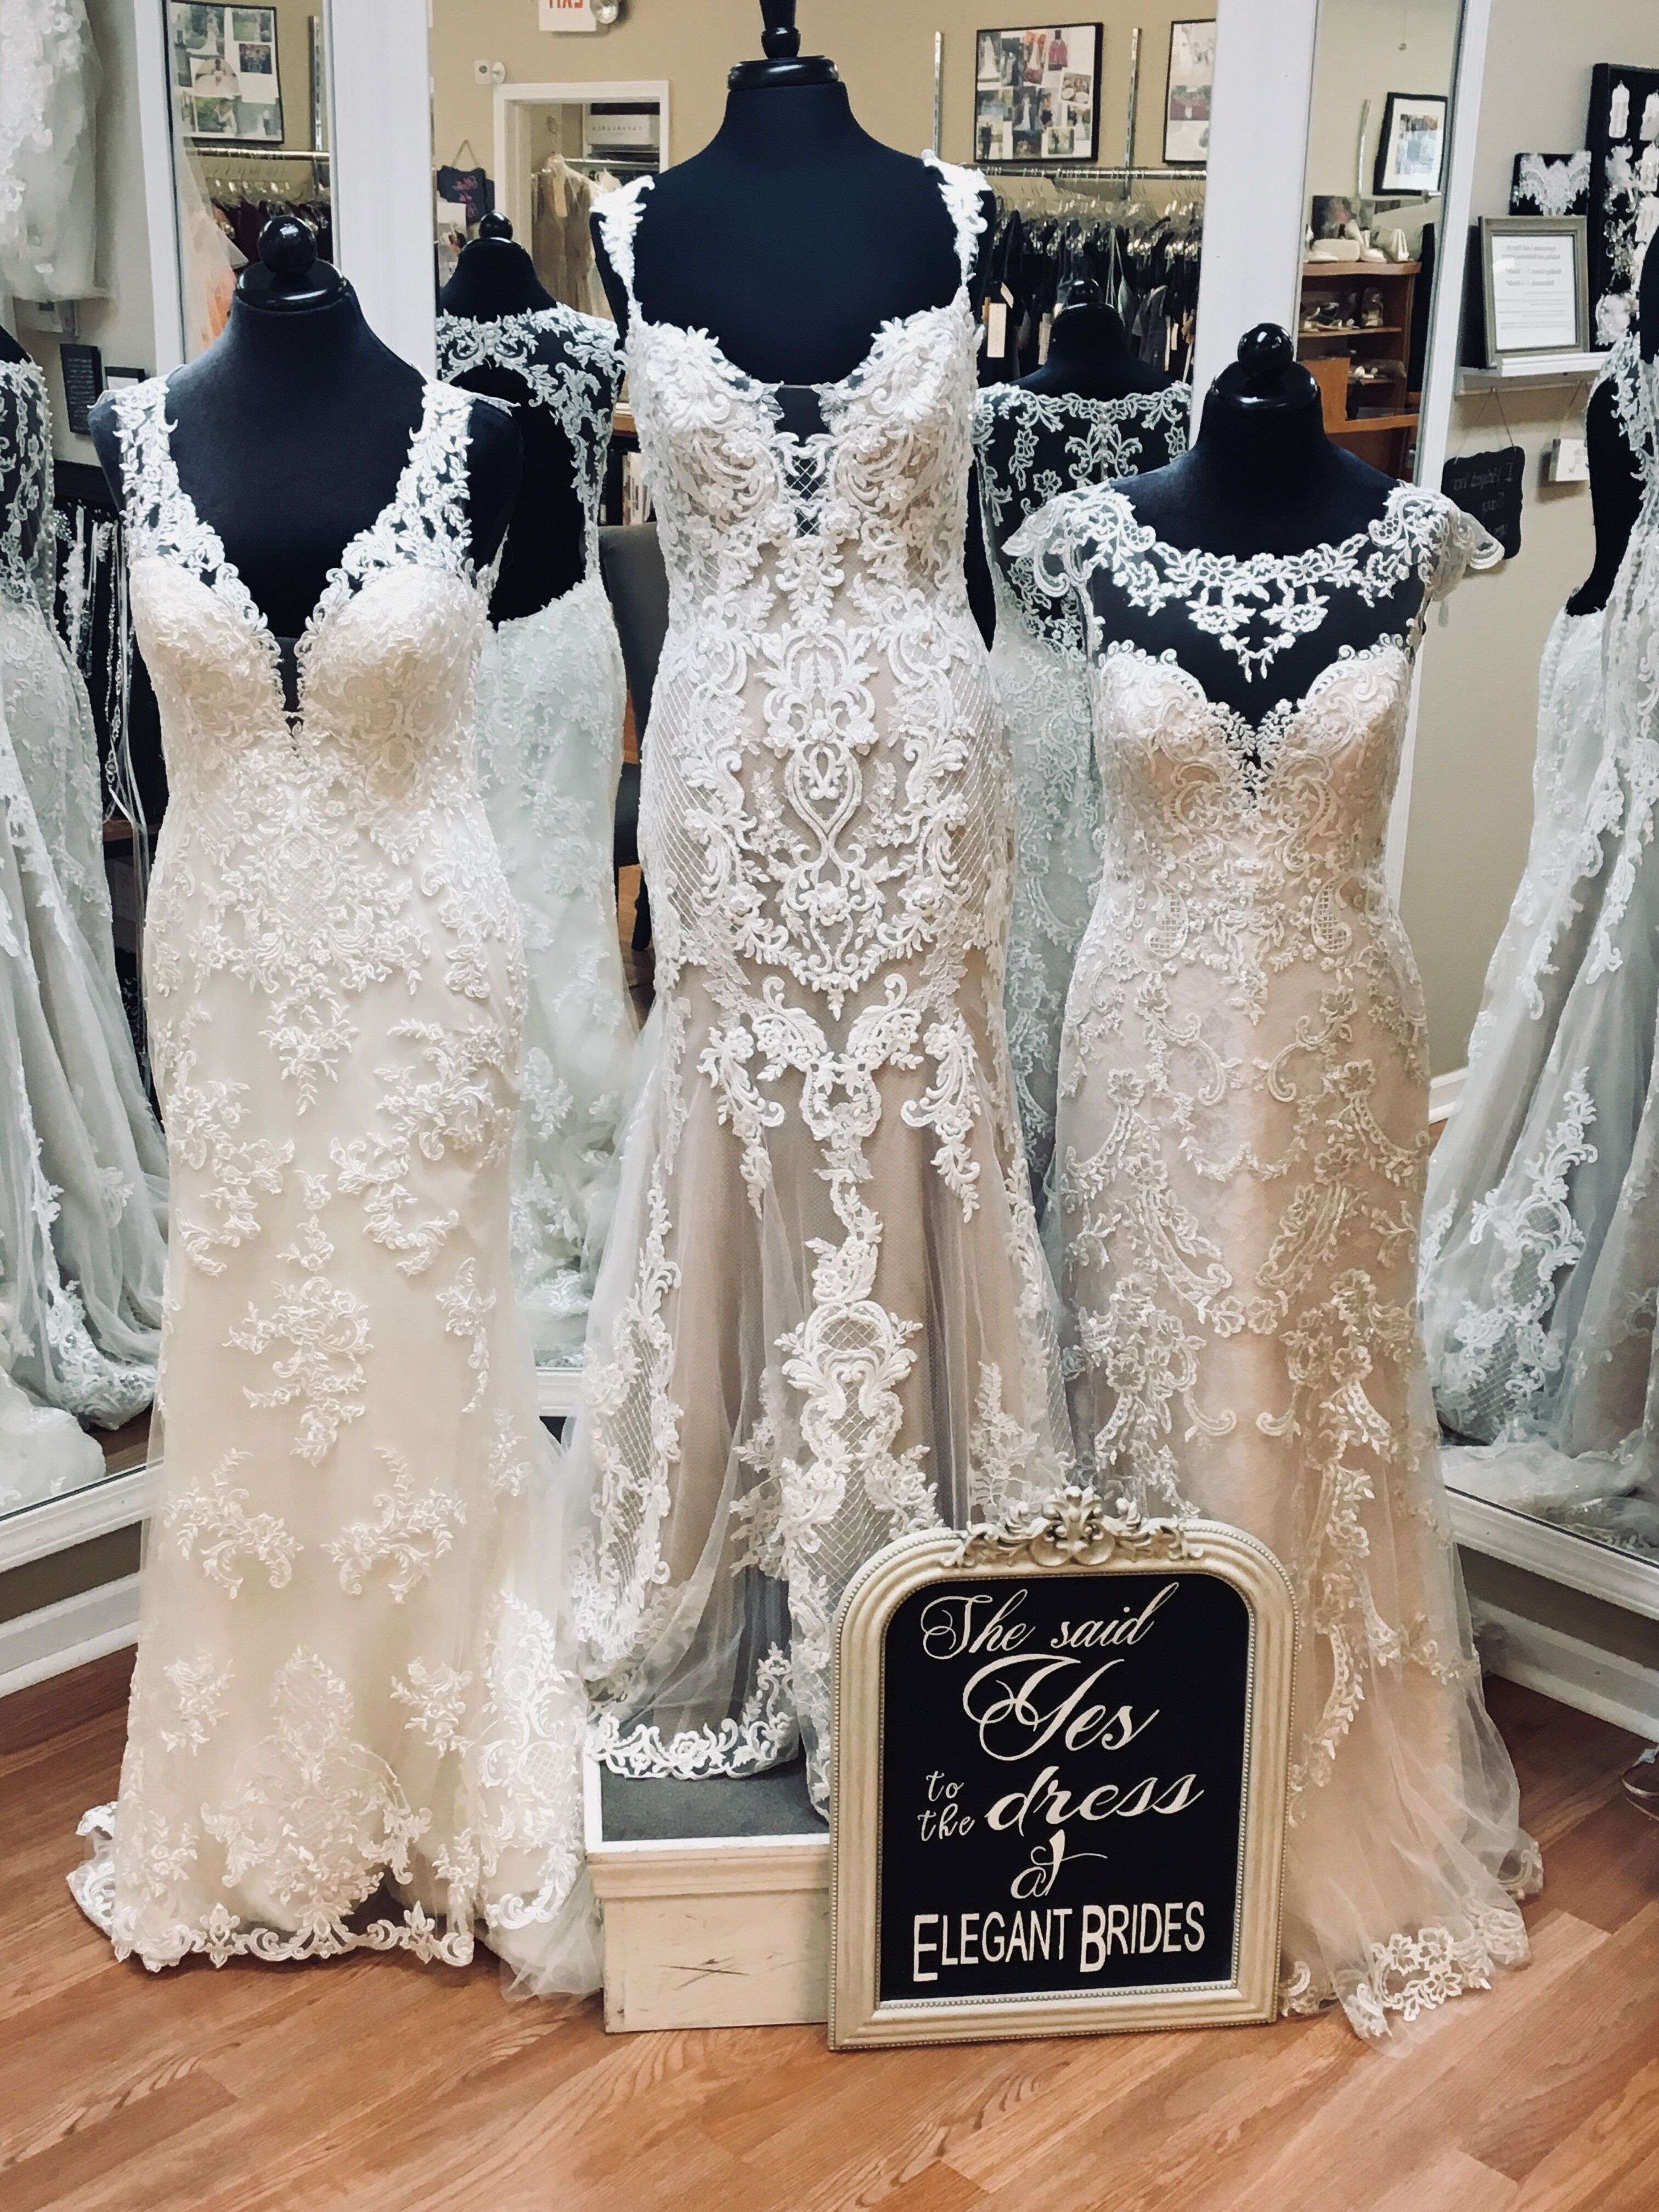 Elegant Brides   Bridal Salons   The Knot